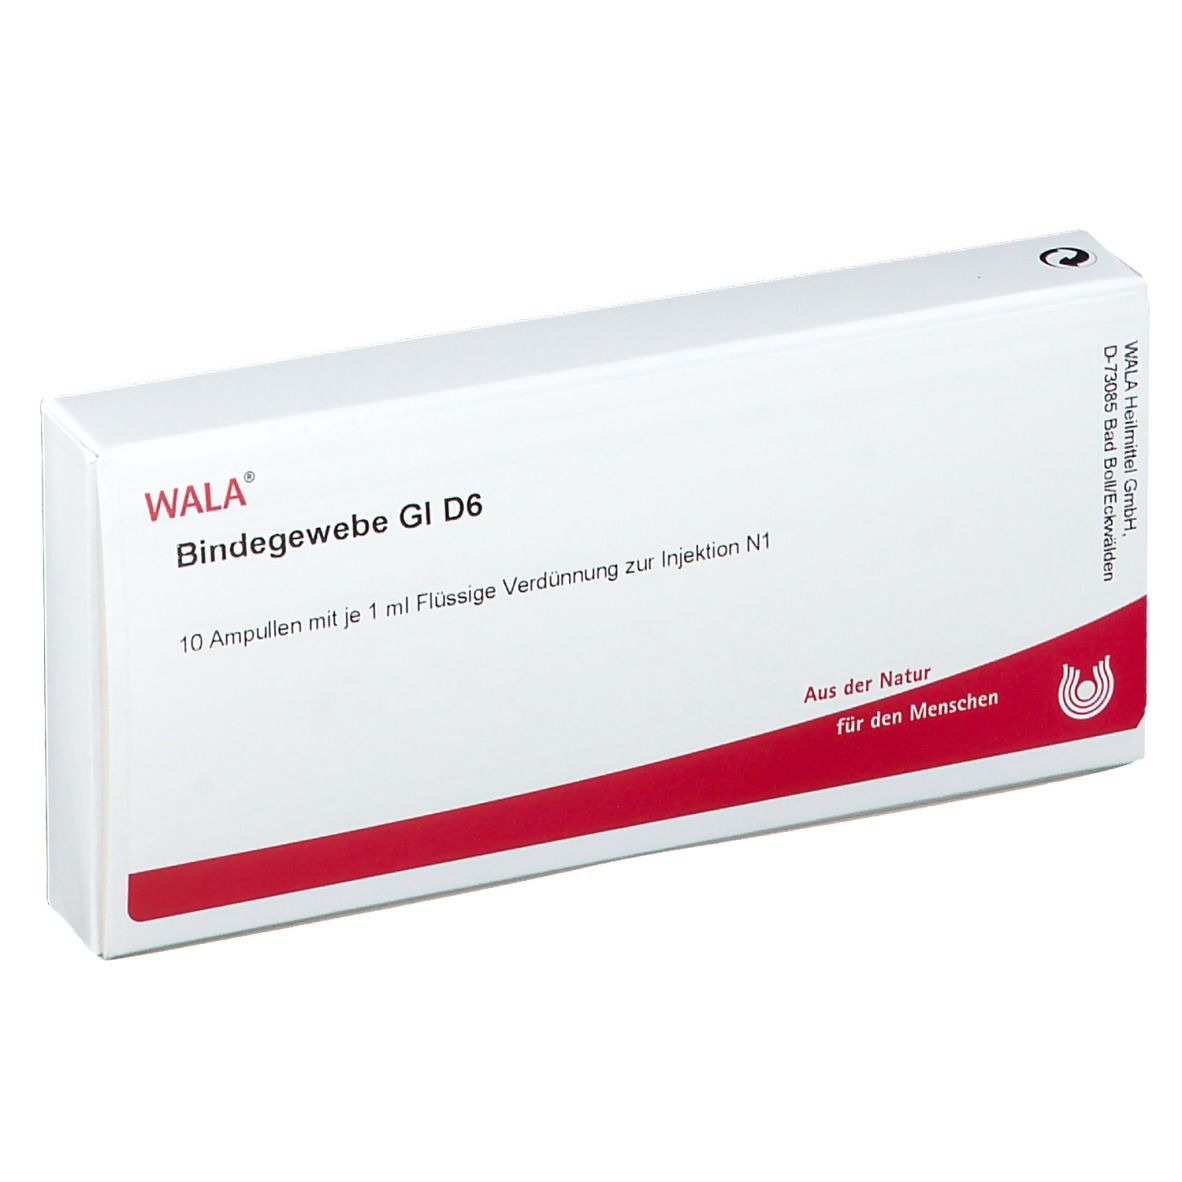 Wala® Bindegewebe Gl D 6